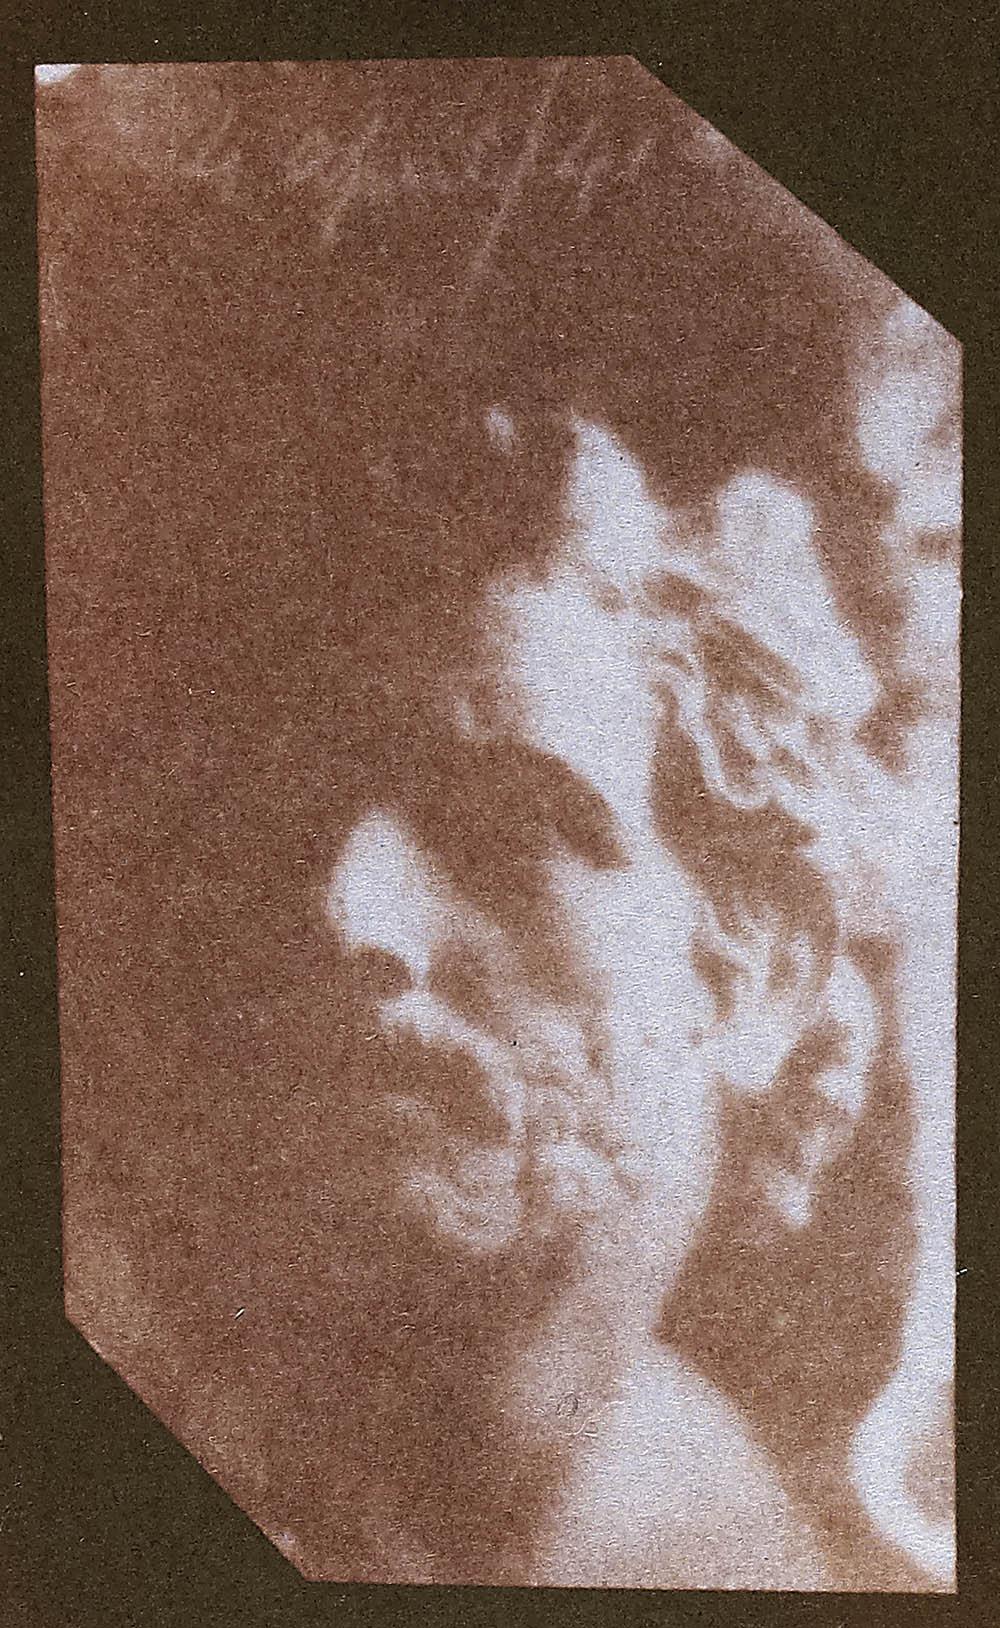 SC1116_1937-368-19